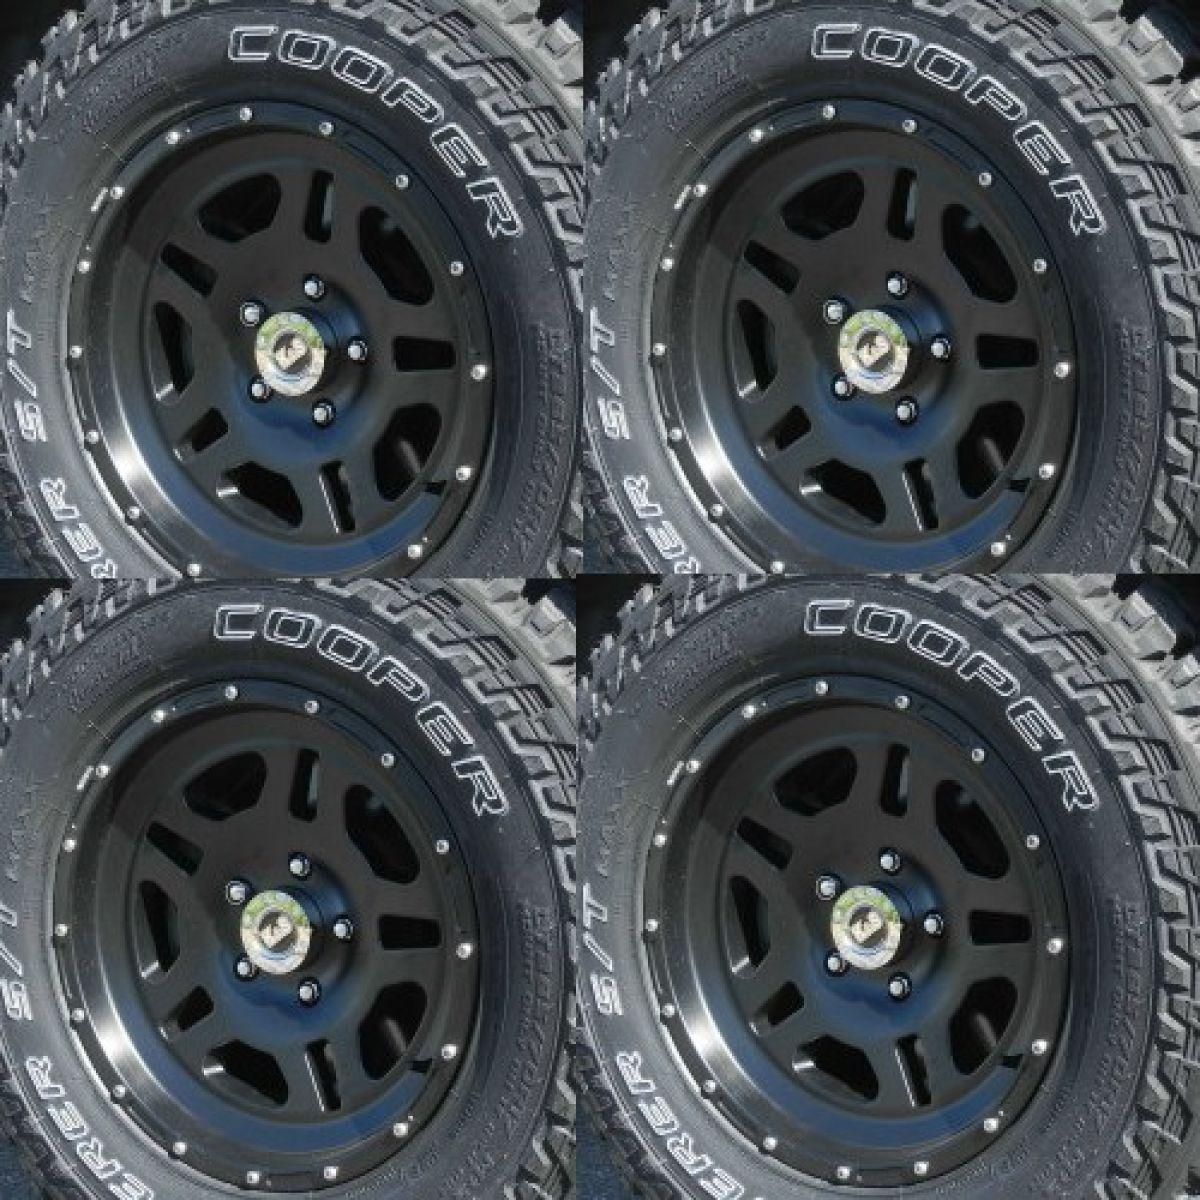 reifen und alu felge atlanta schwarz 8 5x17 et 10 jeep wrangler jk 4stck t v 285 700r17 s t. Black Bedroom Furniture Sets. Home Design Ideas